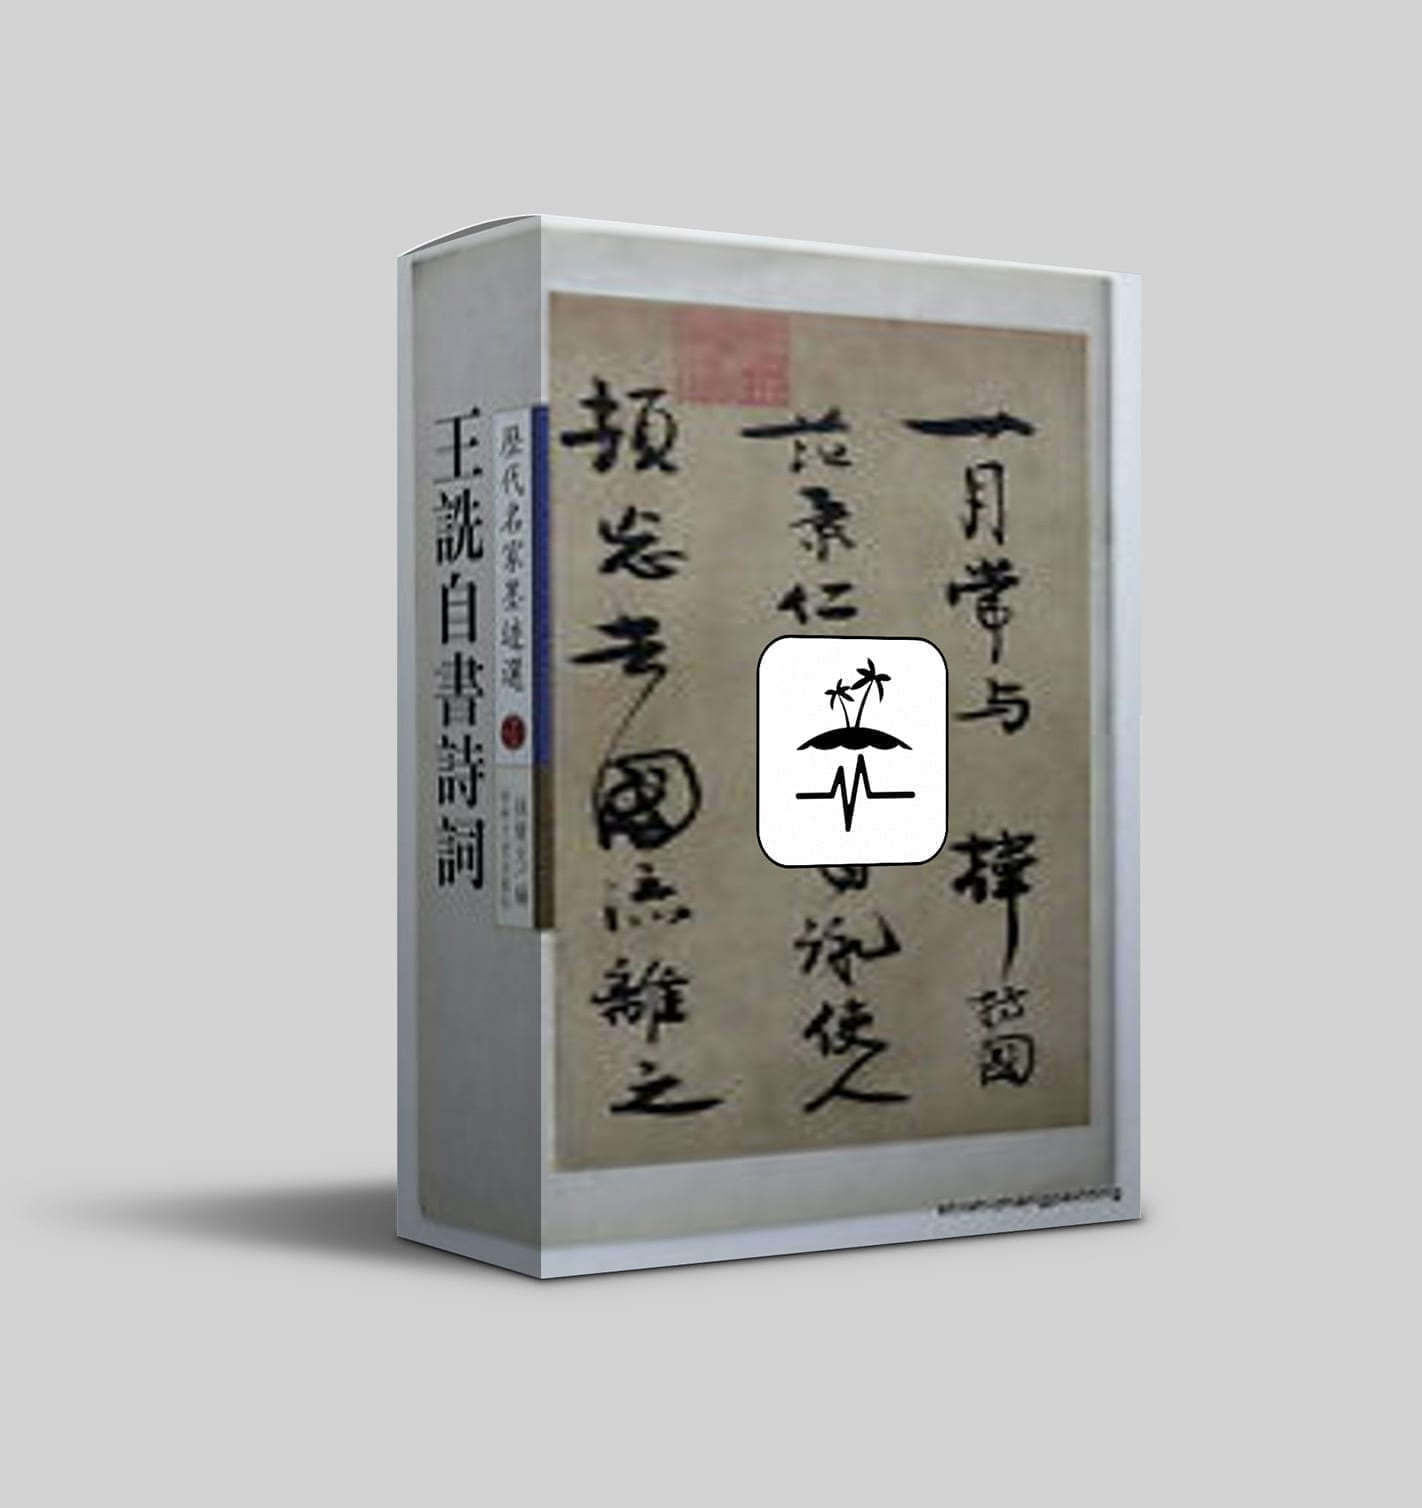 Vyd Beatz - Manuscrit Loop Kit